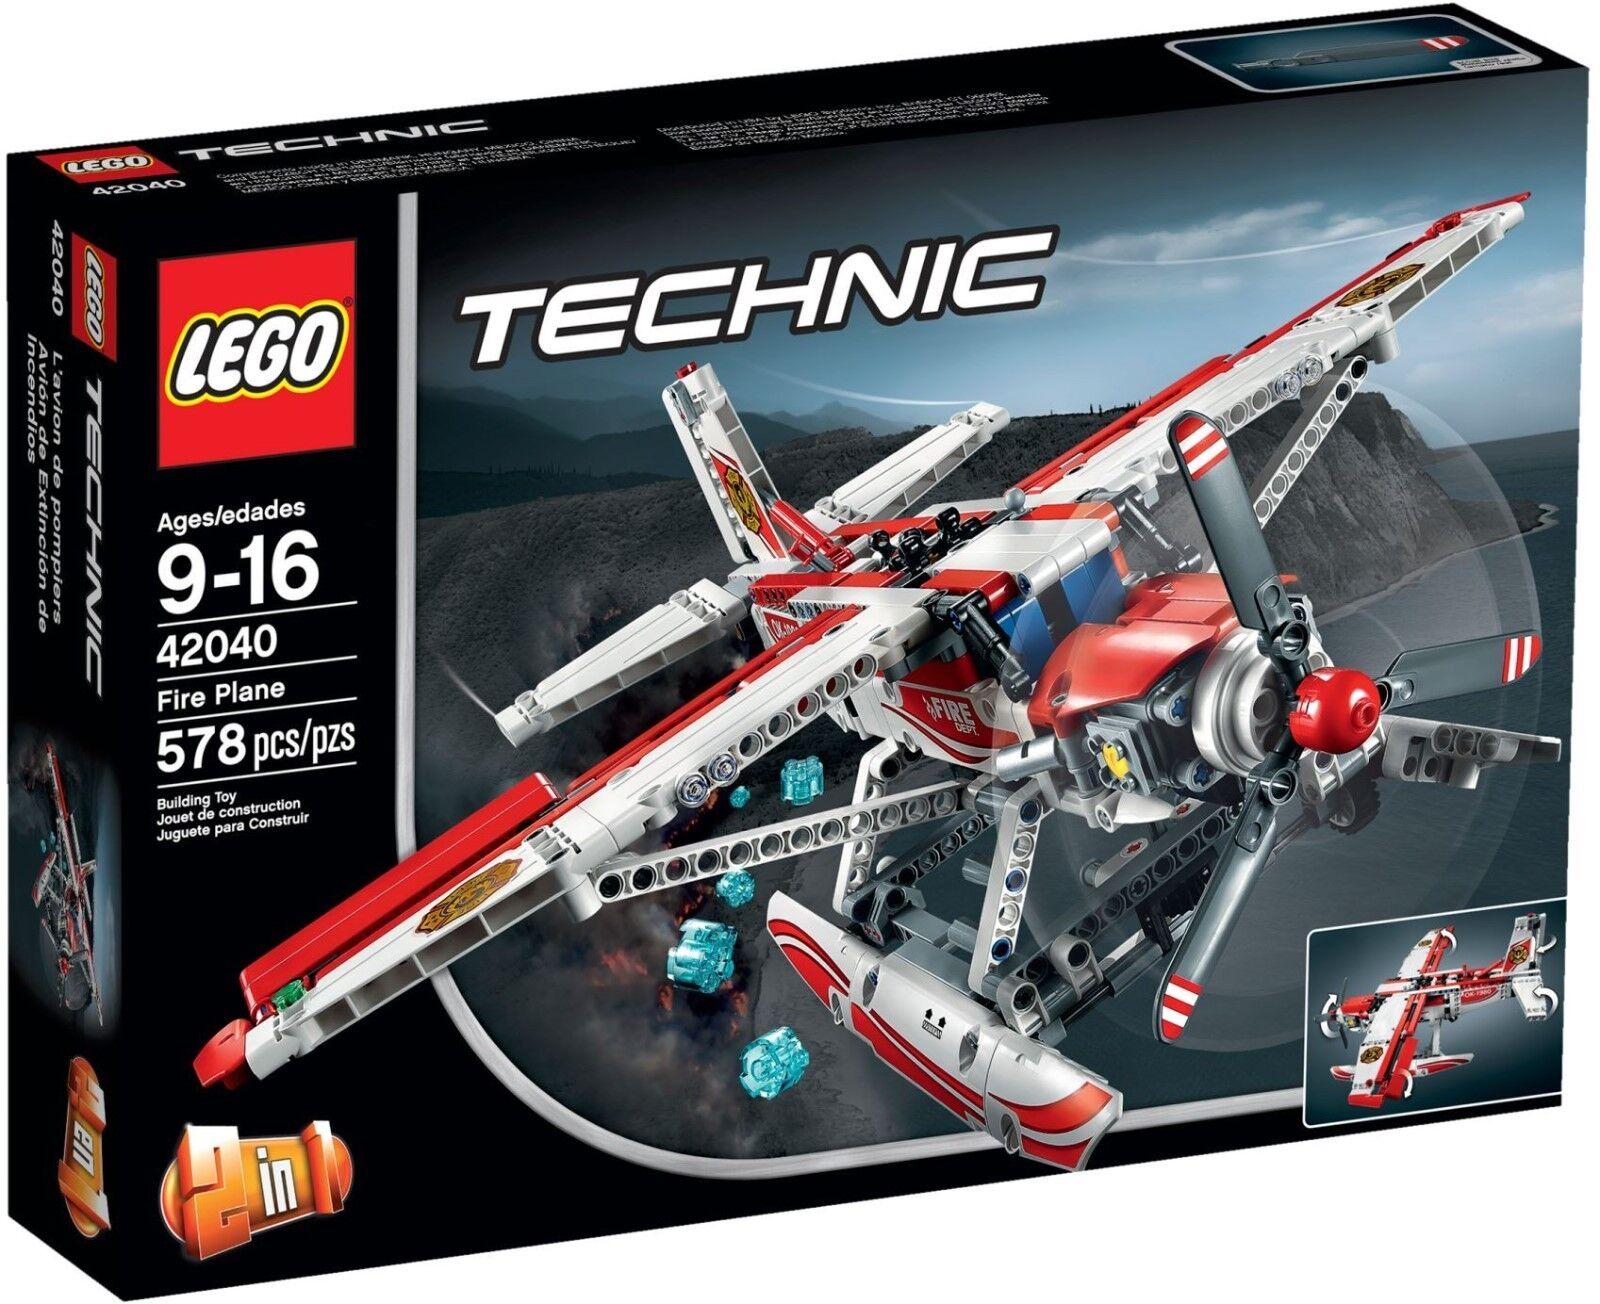 LEGO Technic Fire Plane 42040 - Brand New (Slightly tatty box)